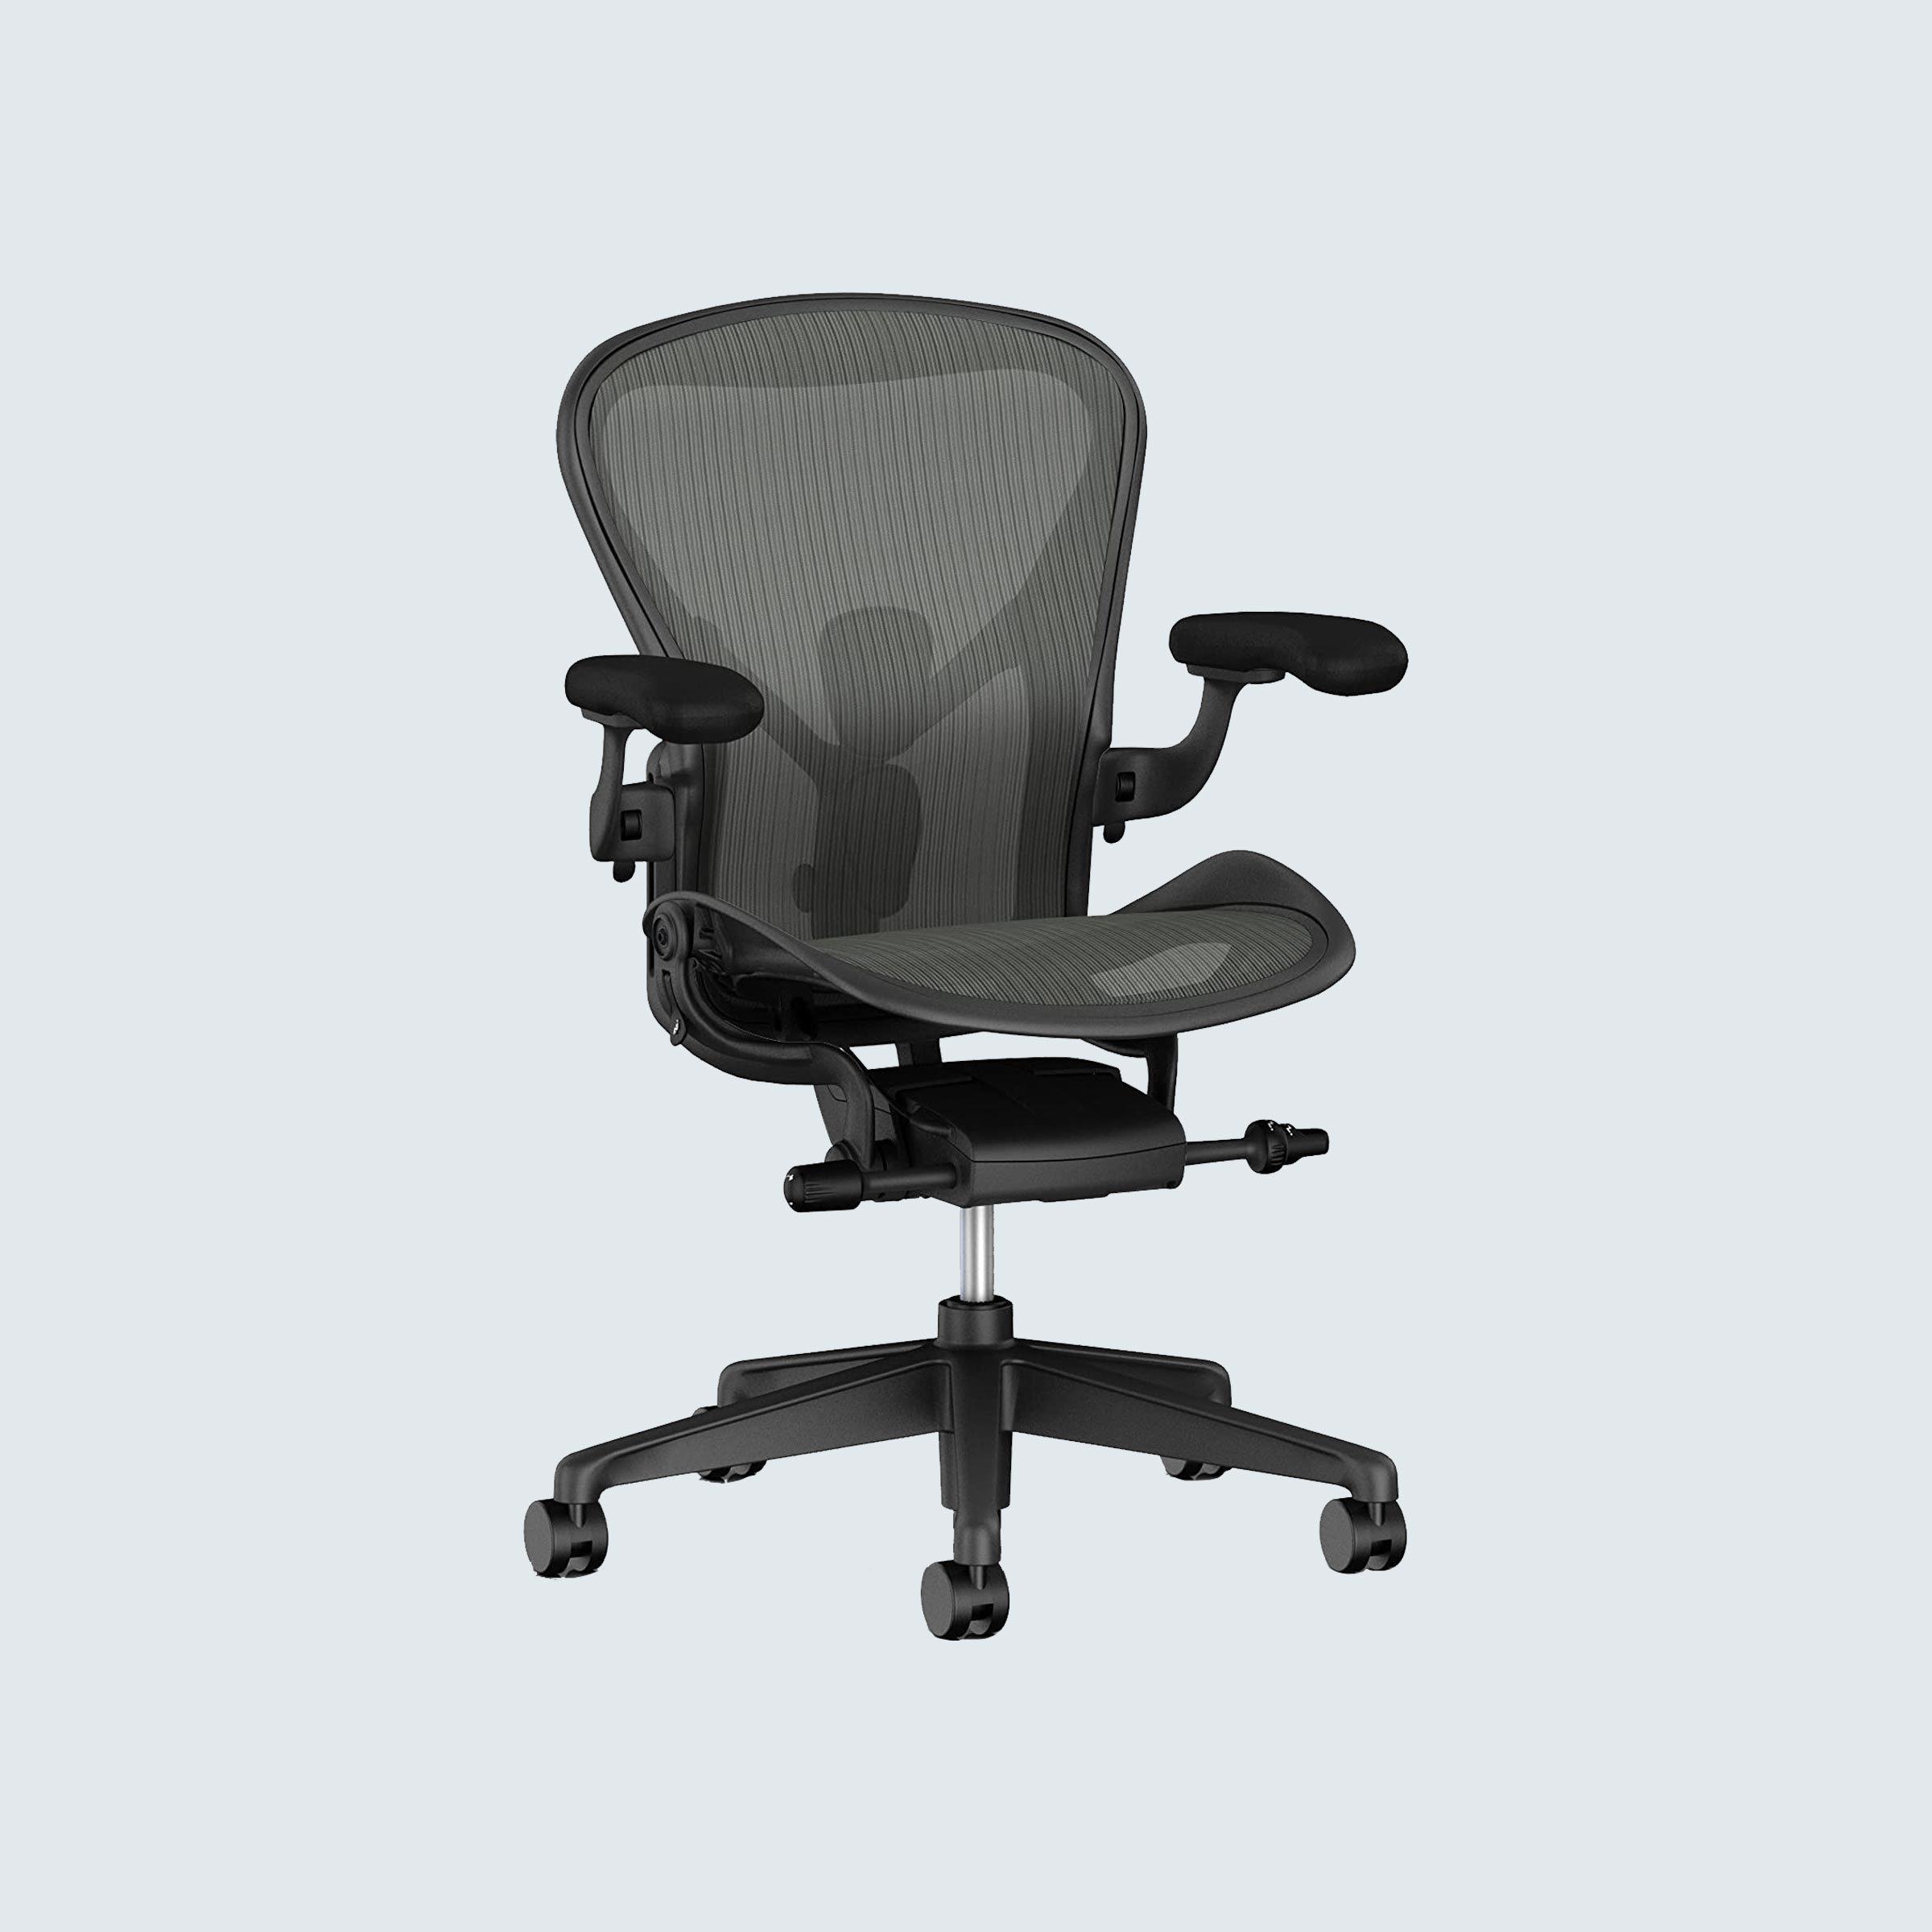 aHerman Miller Furniture Aeron Chair